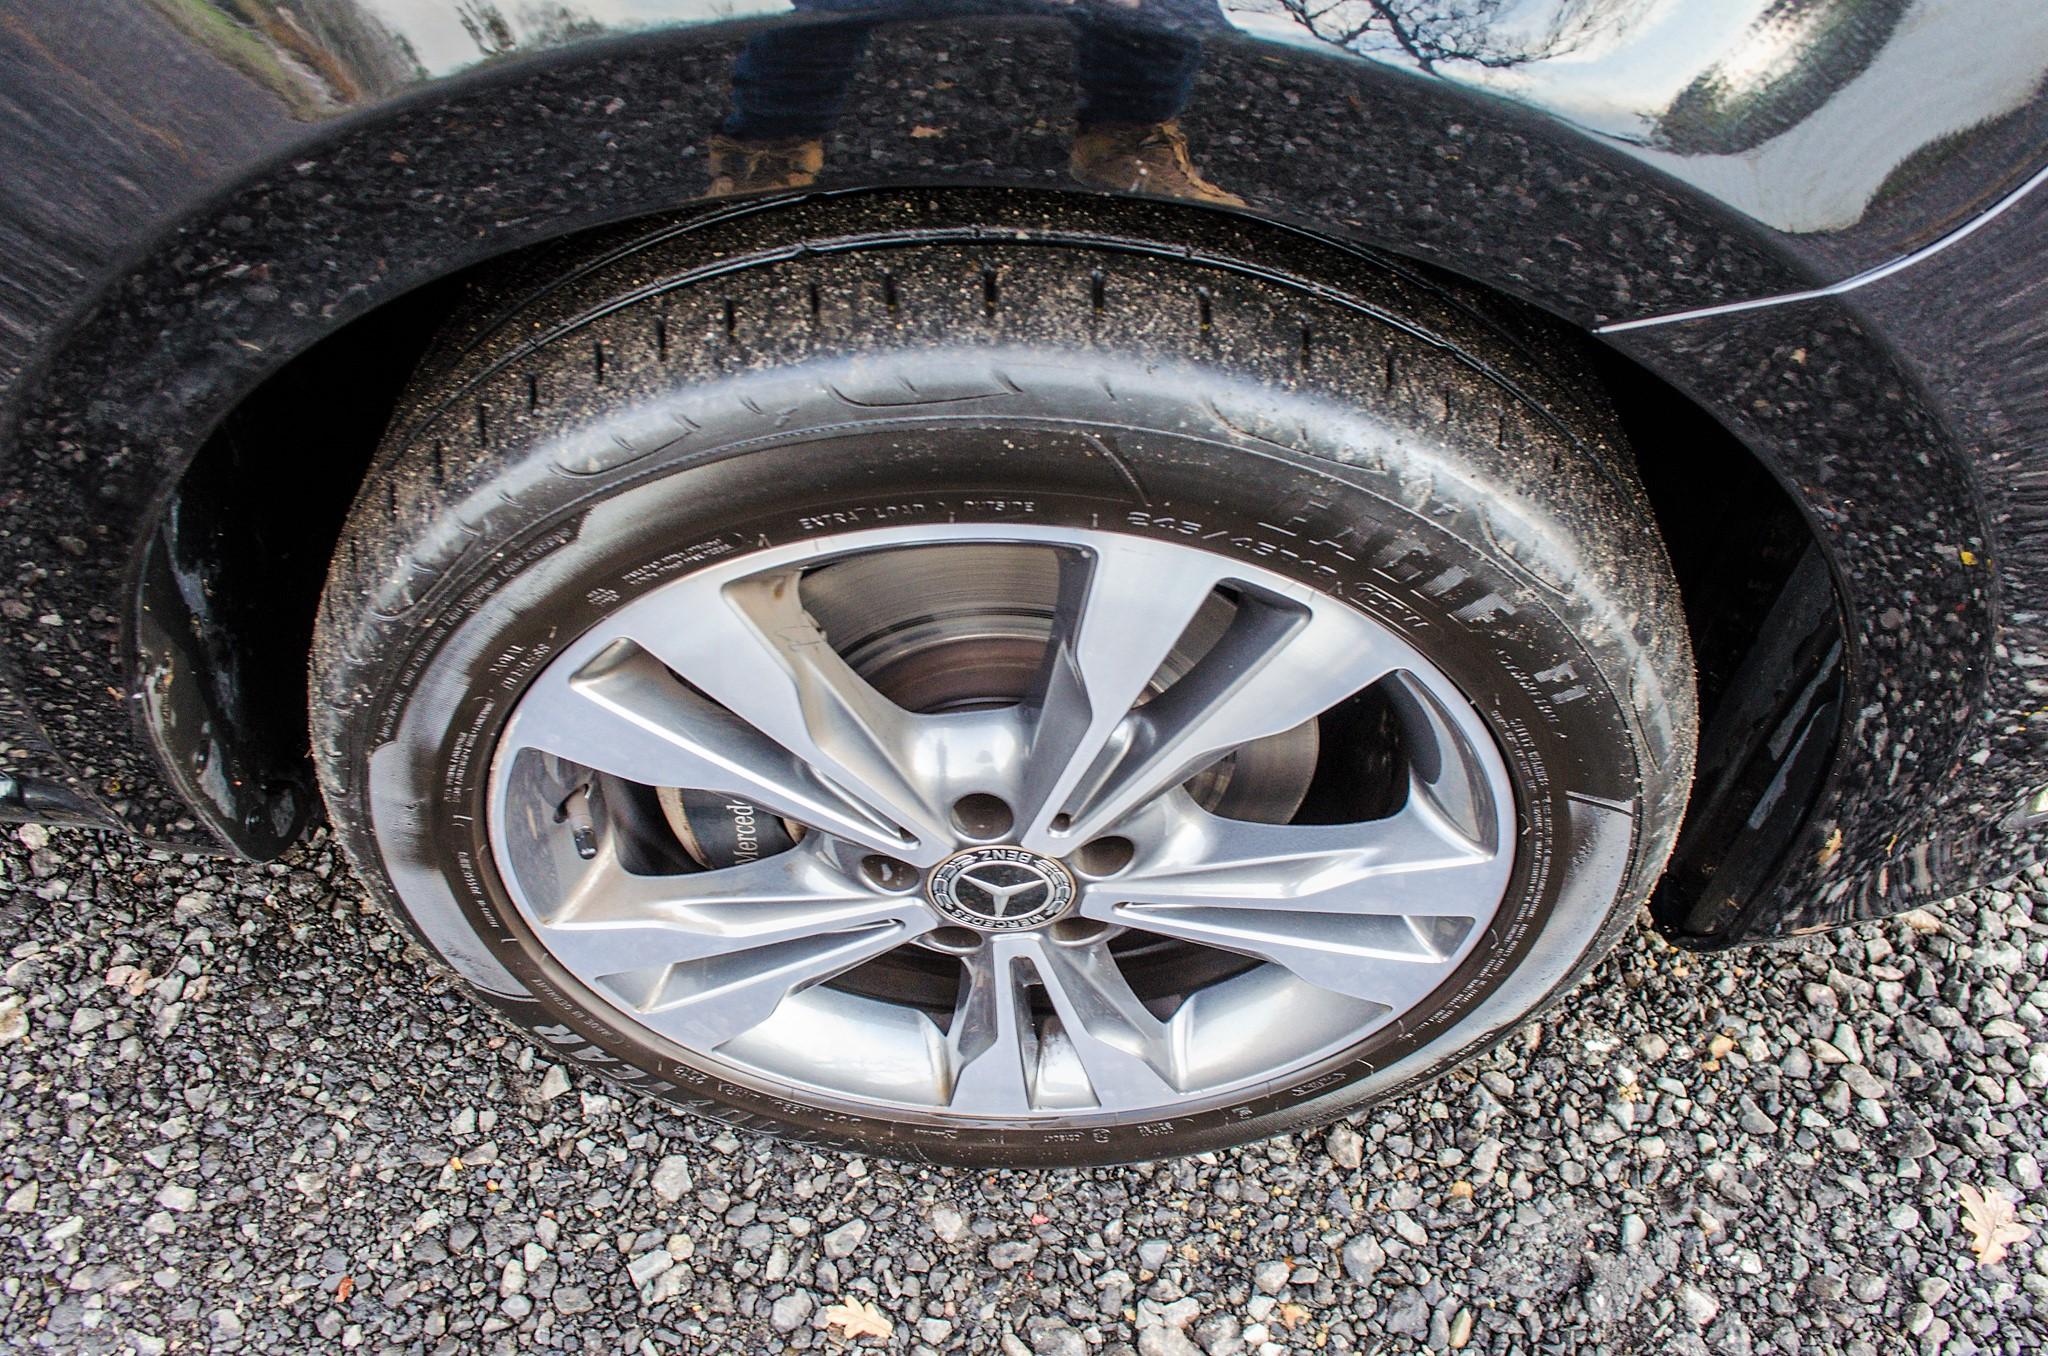 Mercedes Benz V250 Sport Bluetec XLWB auto diesel 8 seat MPV Reg No: FY68 JTO Date of First - Image 13 of 27